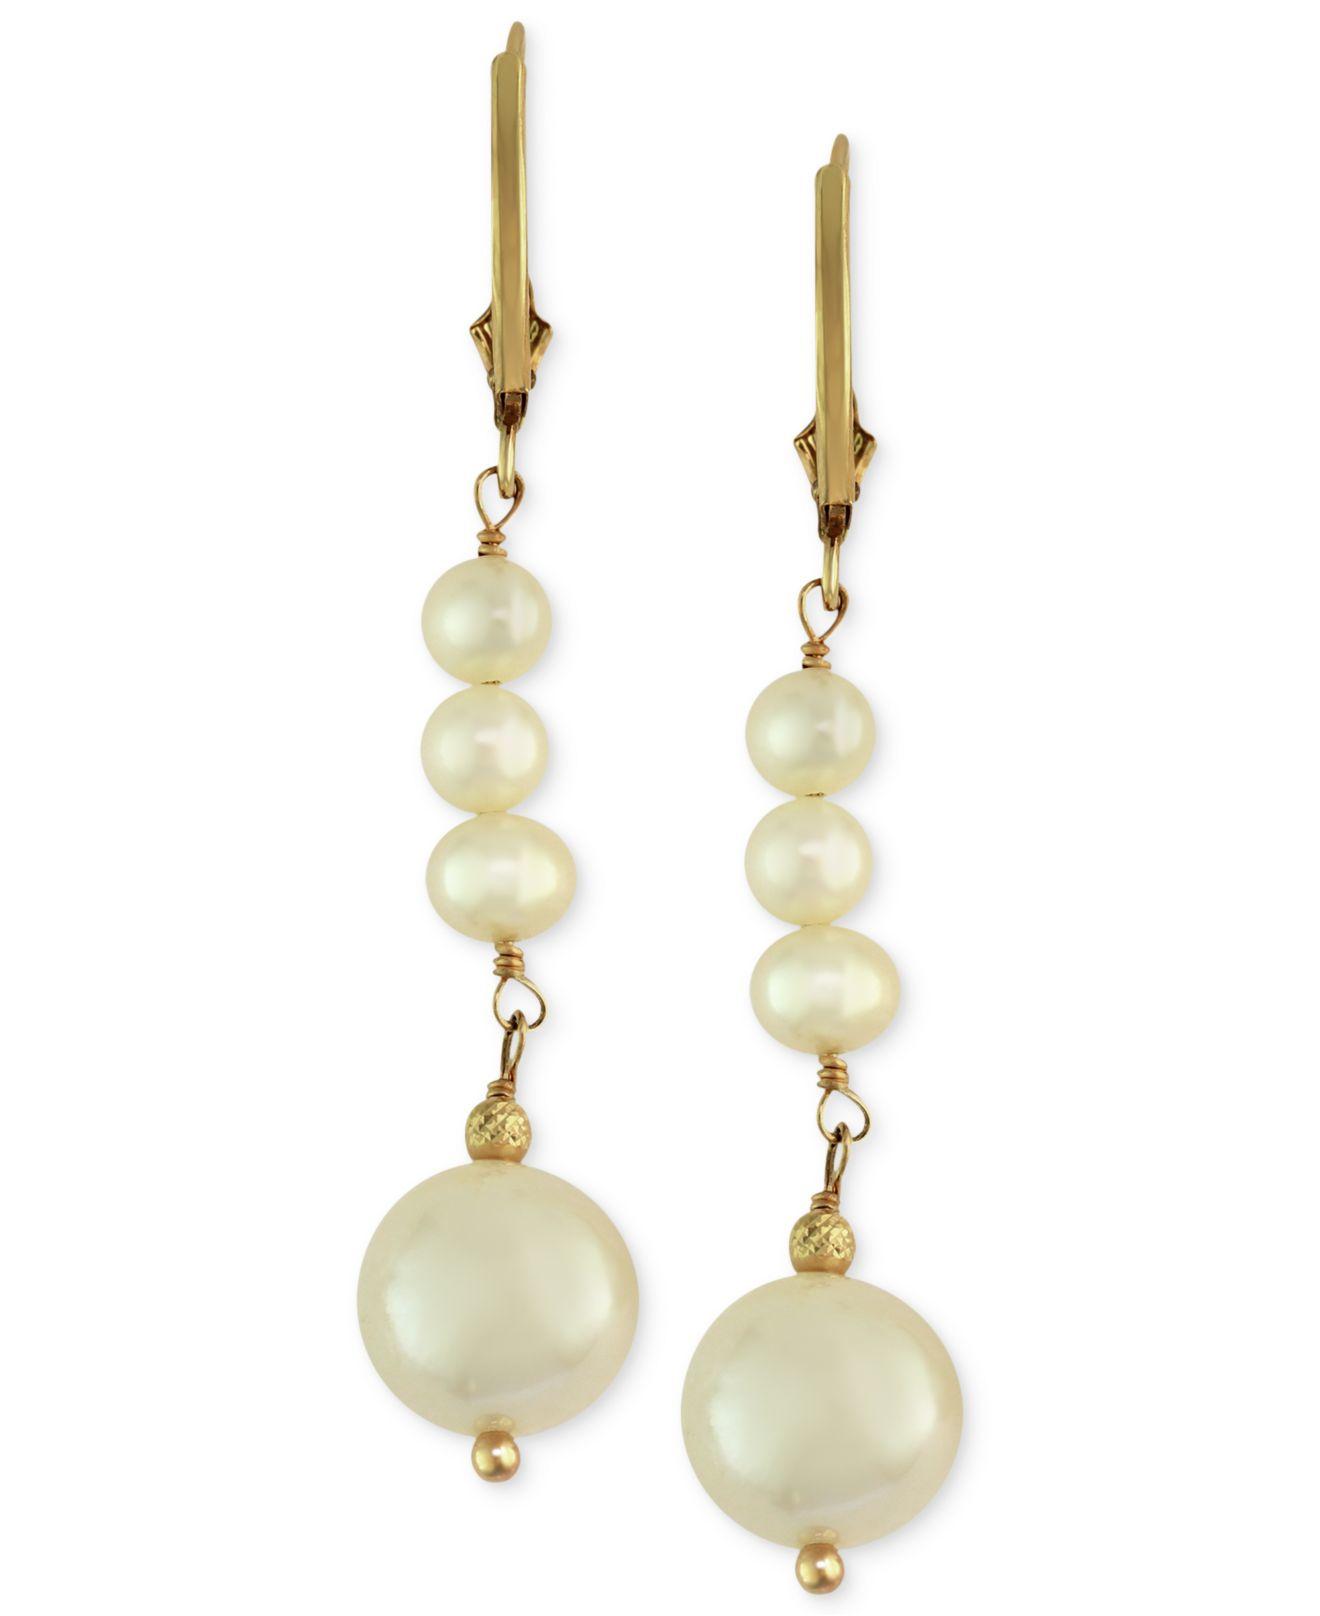 Effy Collection Women's Metallic Cultured Freshwater Pearl Earrings